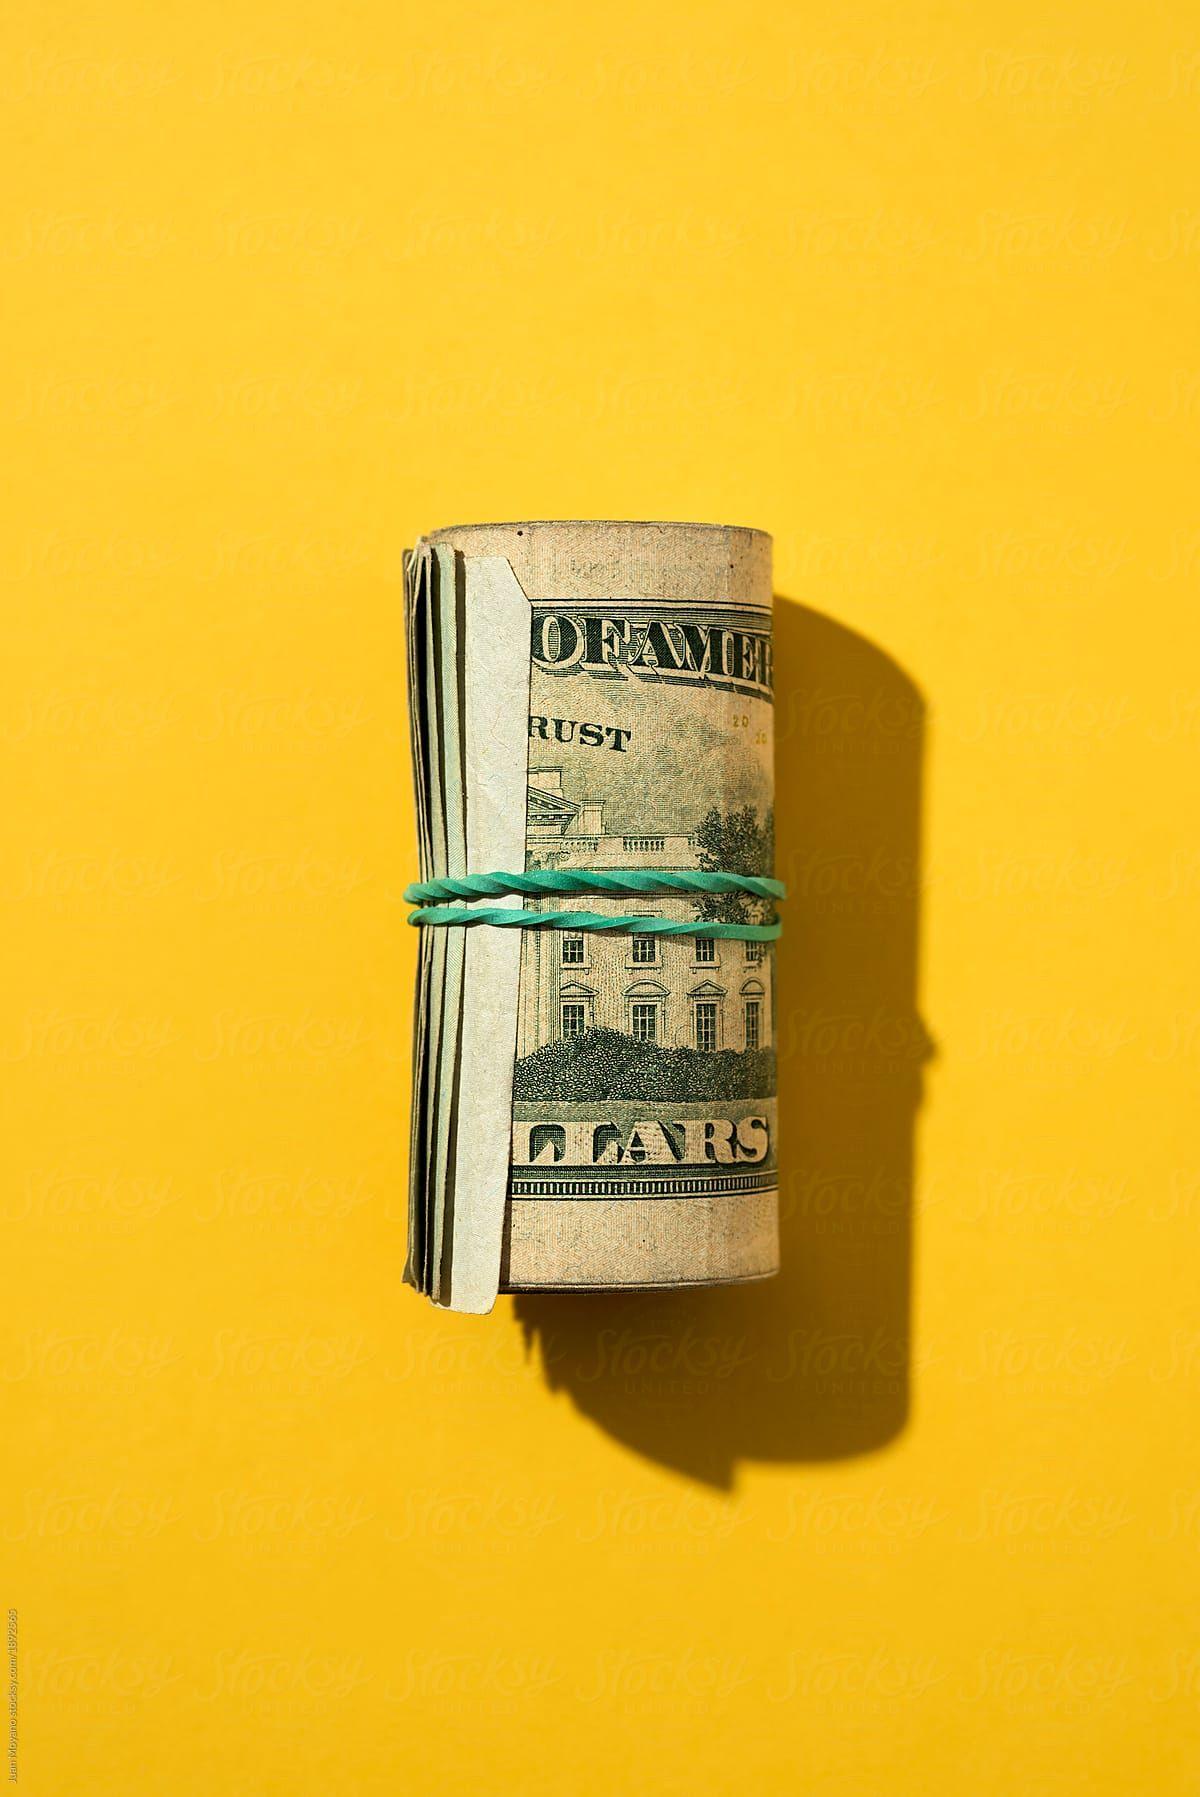 Download Wallpaper 640x1136 dollars, money, notes, case